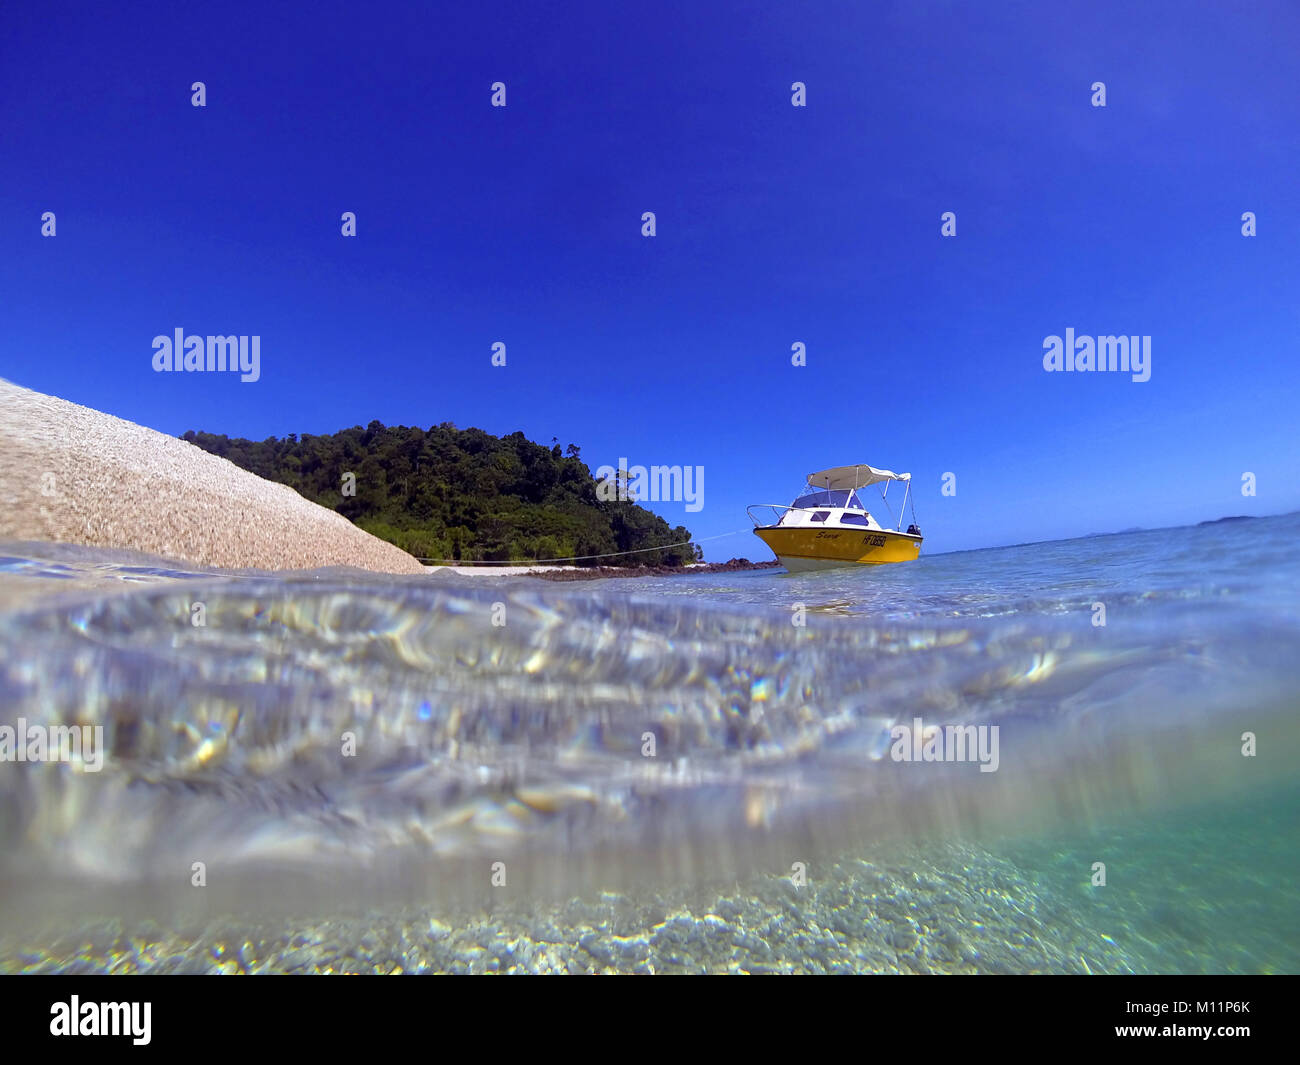 Boat at Kent Island, Barnard Island Group, near Mourilyan, Queensland, Australia. No PR Stock Photo